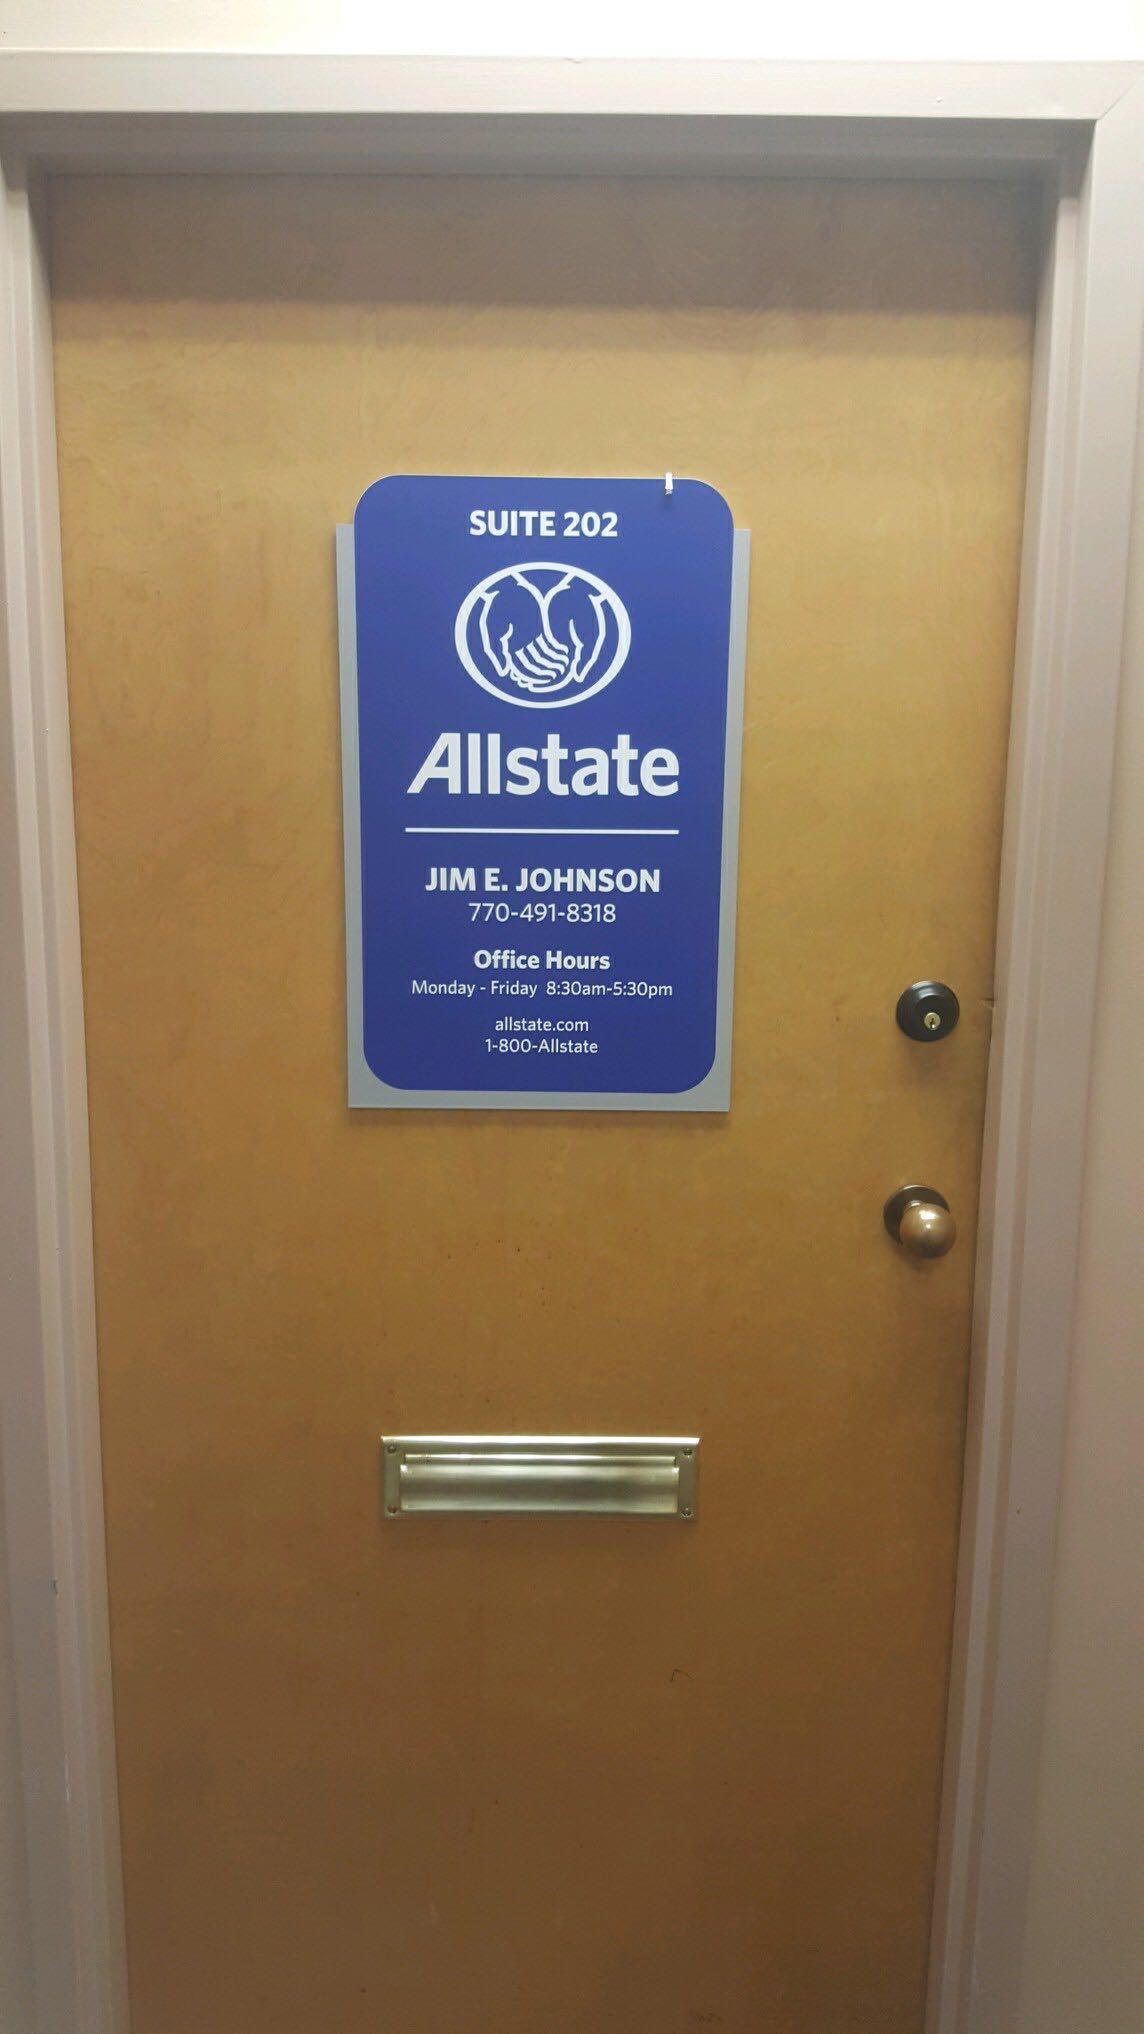 Jim E. Johnson: Allstate Insurance image 2